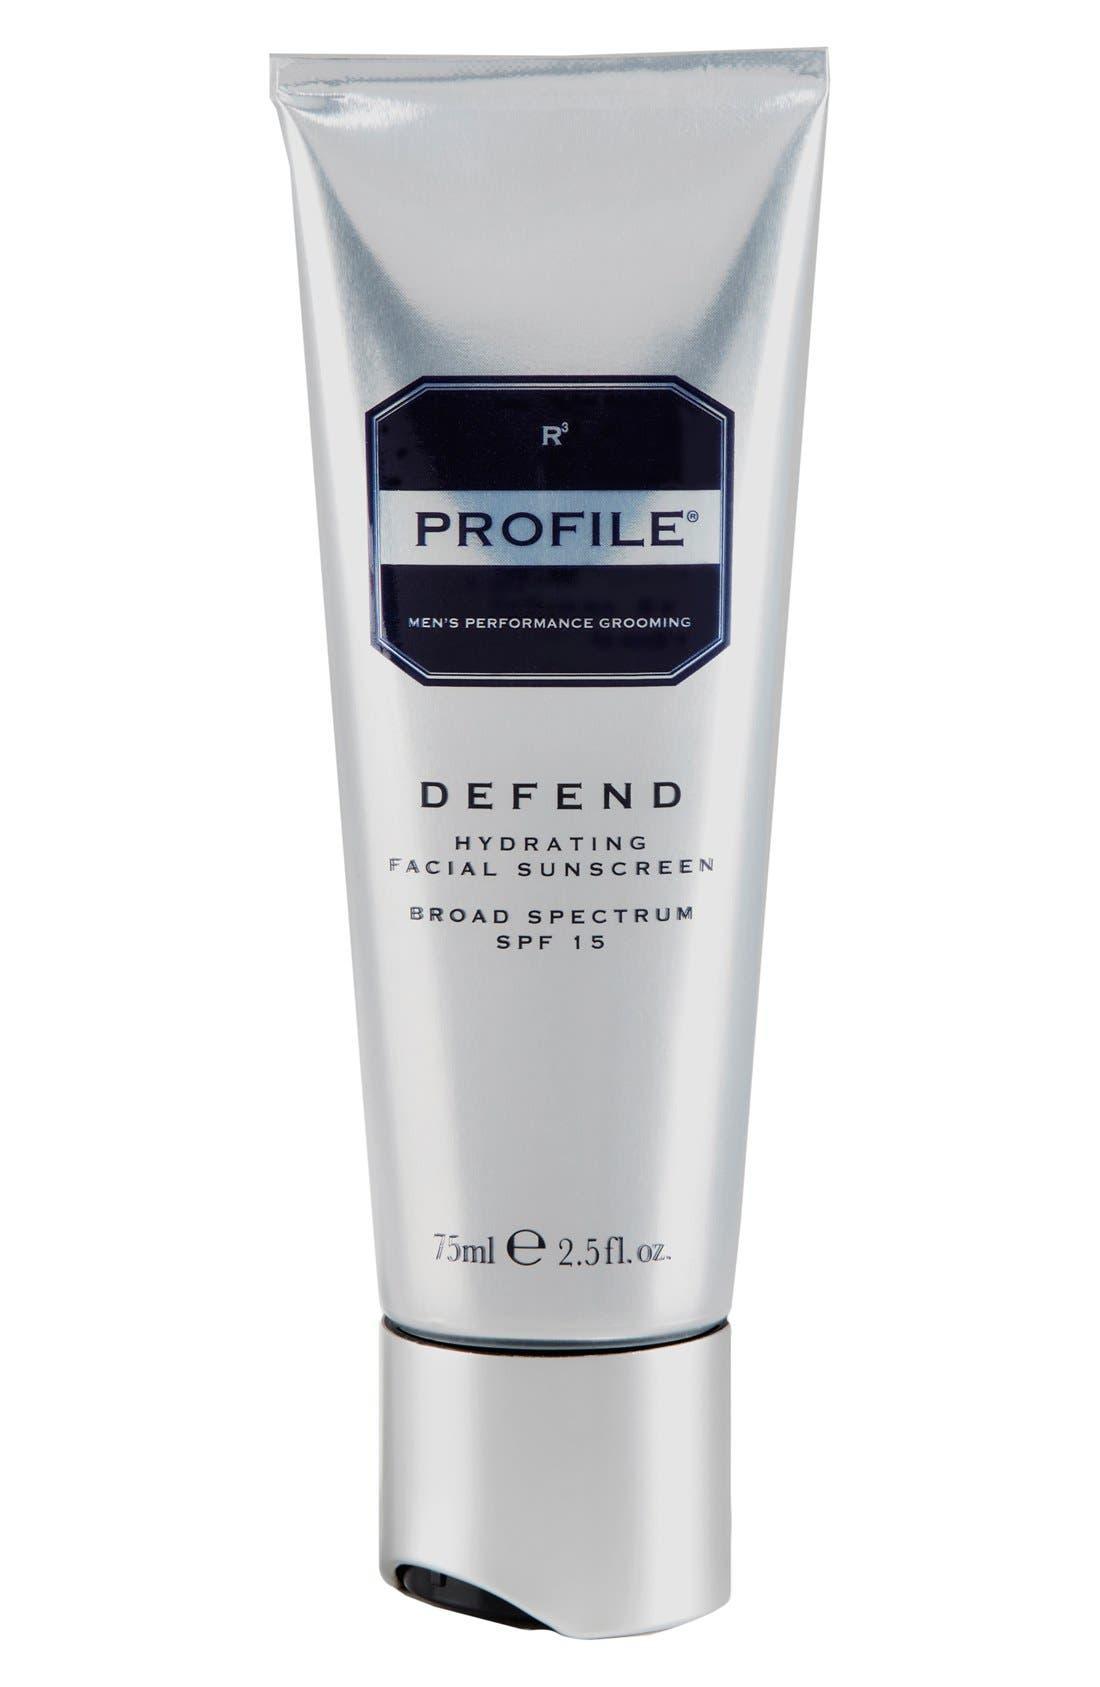 PROFILE® 'Defend' Hydrating Facial Sunscreen Broad Spectrum SPF 15